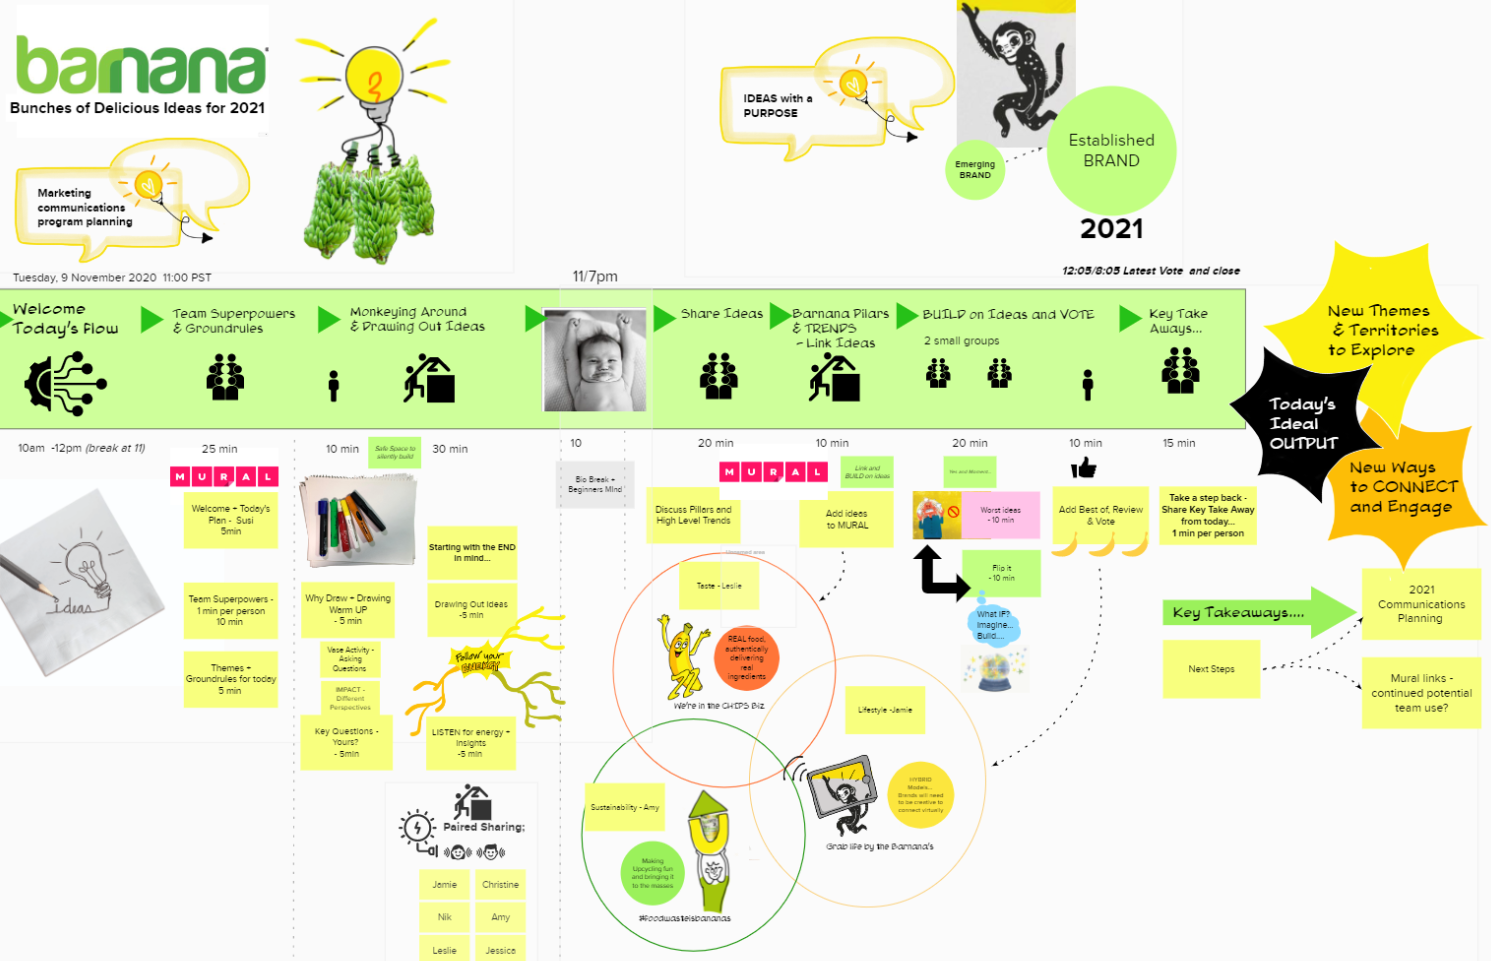 Brand Brainstorming Session Planning